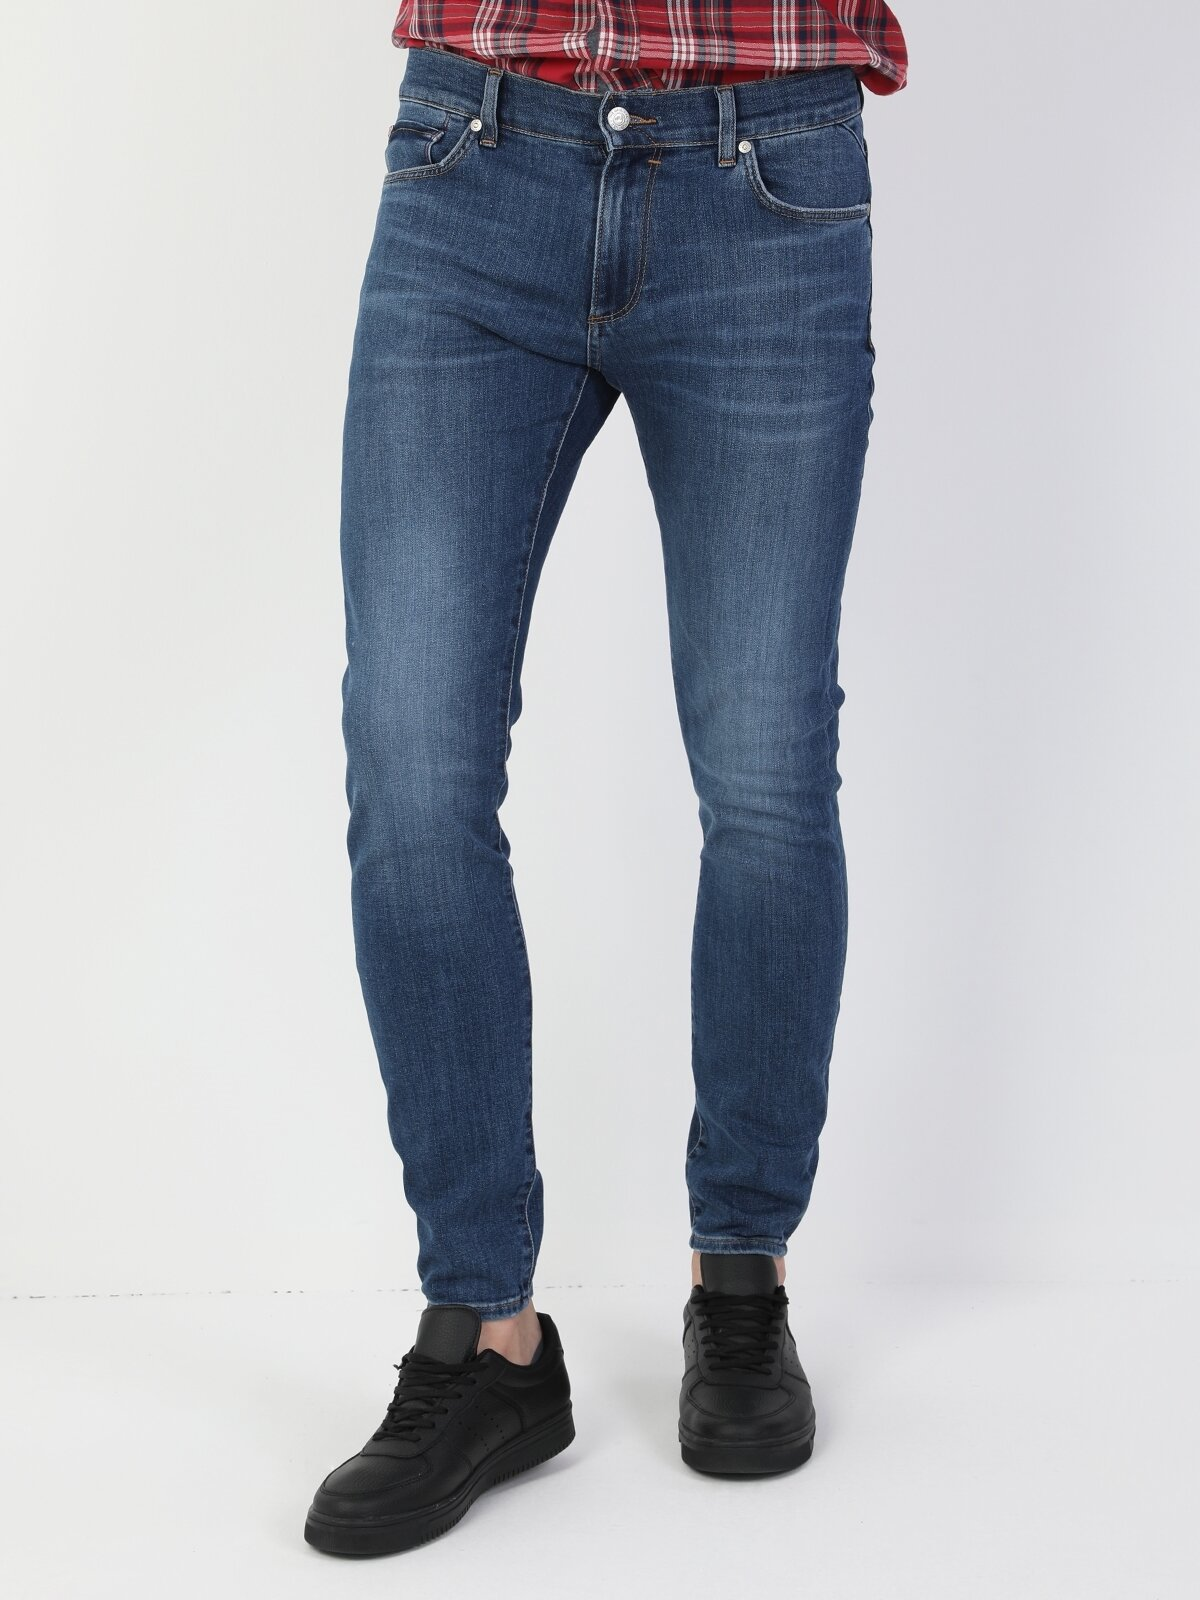 40 Alex Süper Dar Kesim Düşük Bel Süper Dar Paça Erkek Mavi Jean Pantolon